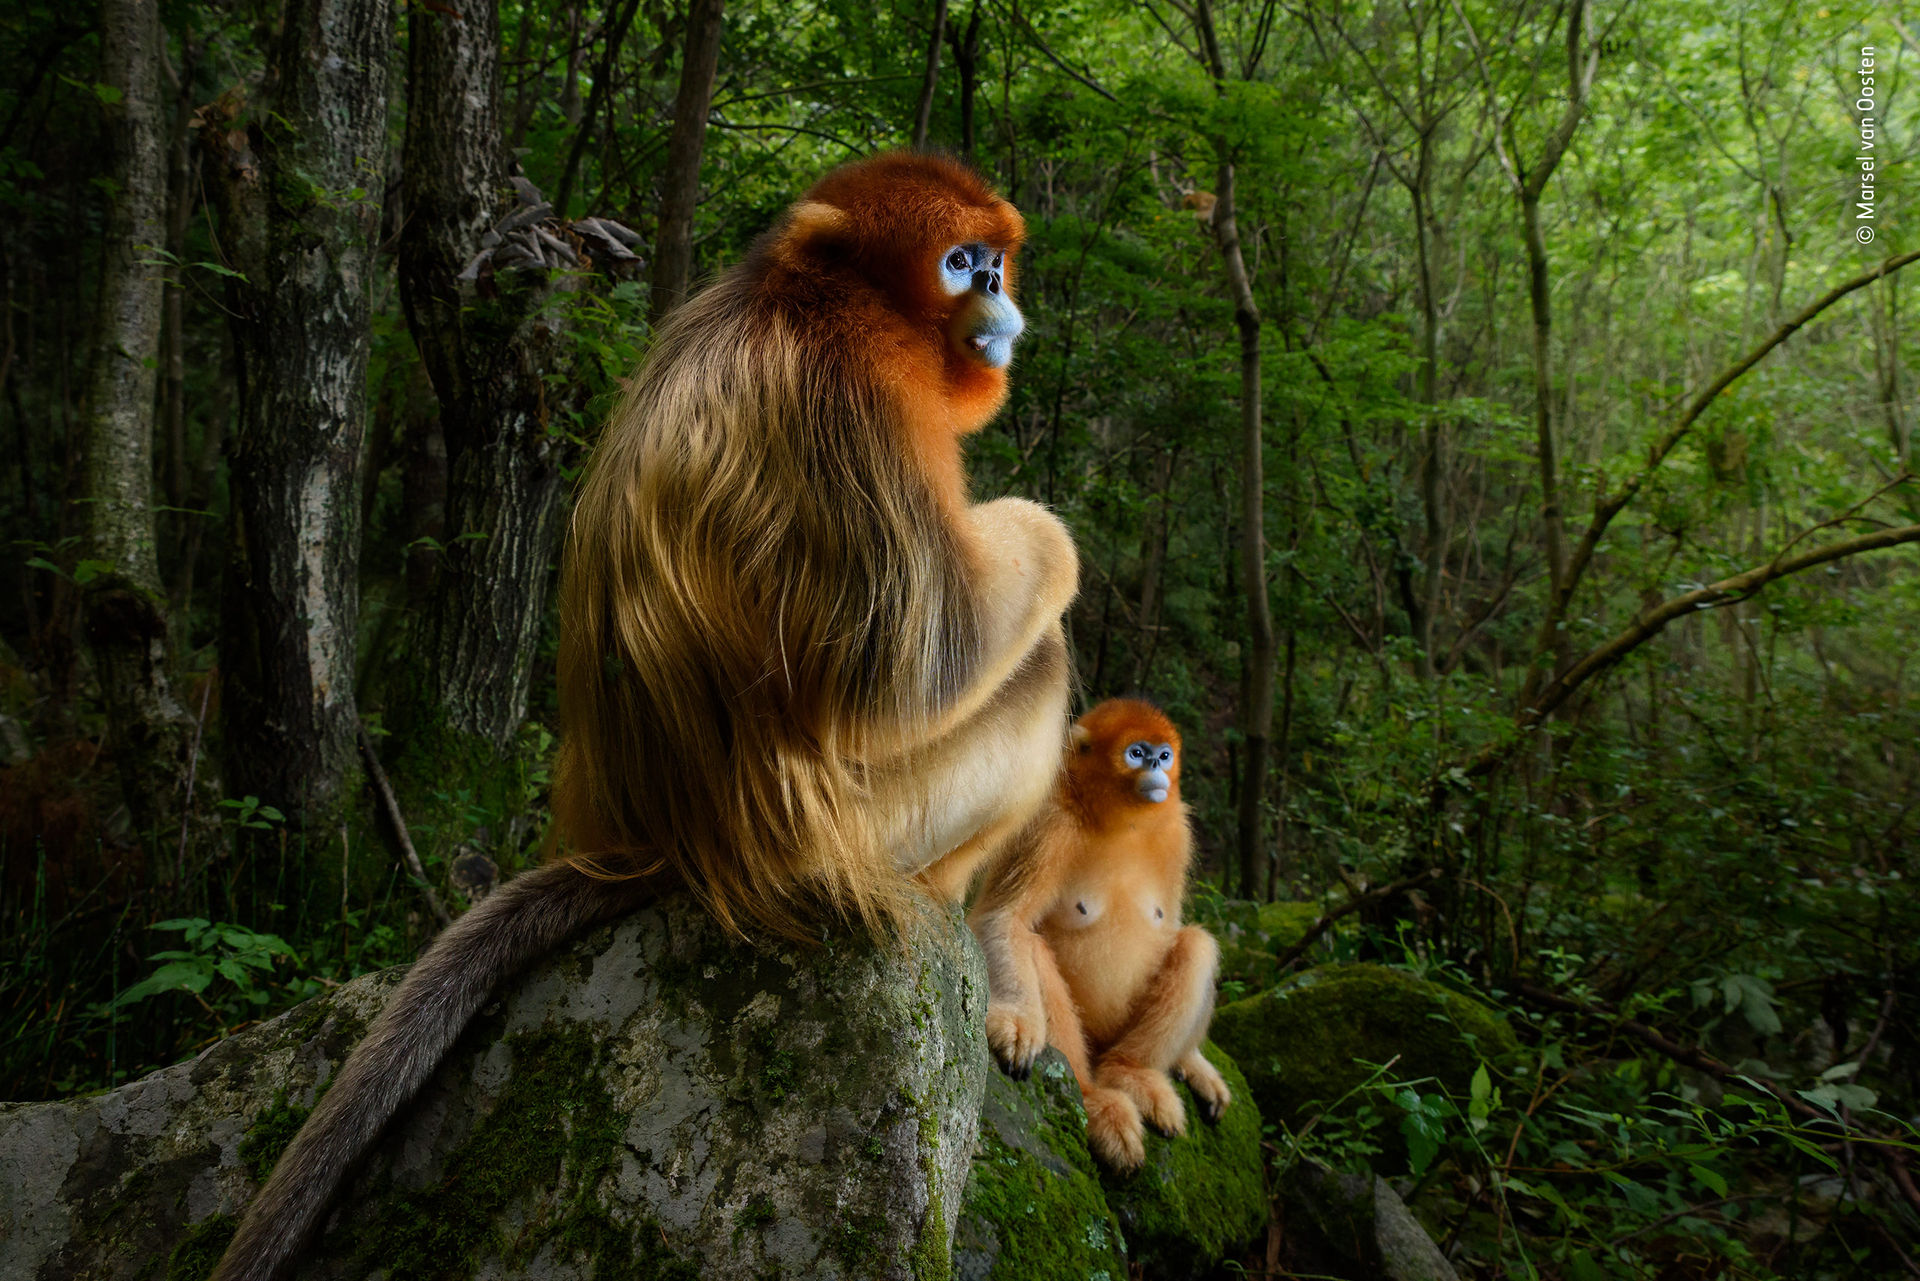 Kolla in Wildlife Photographer of the Year